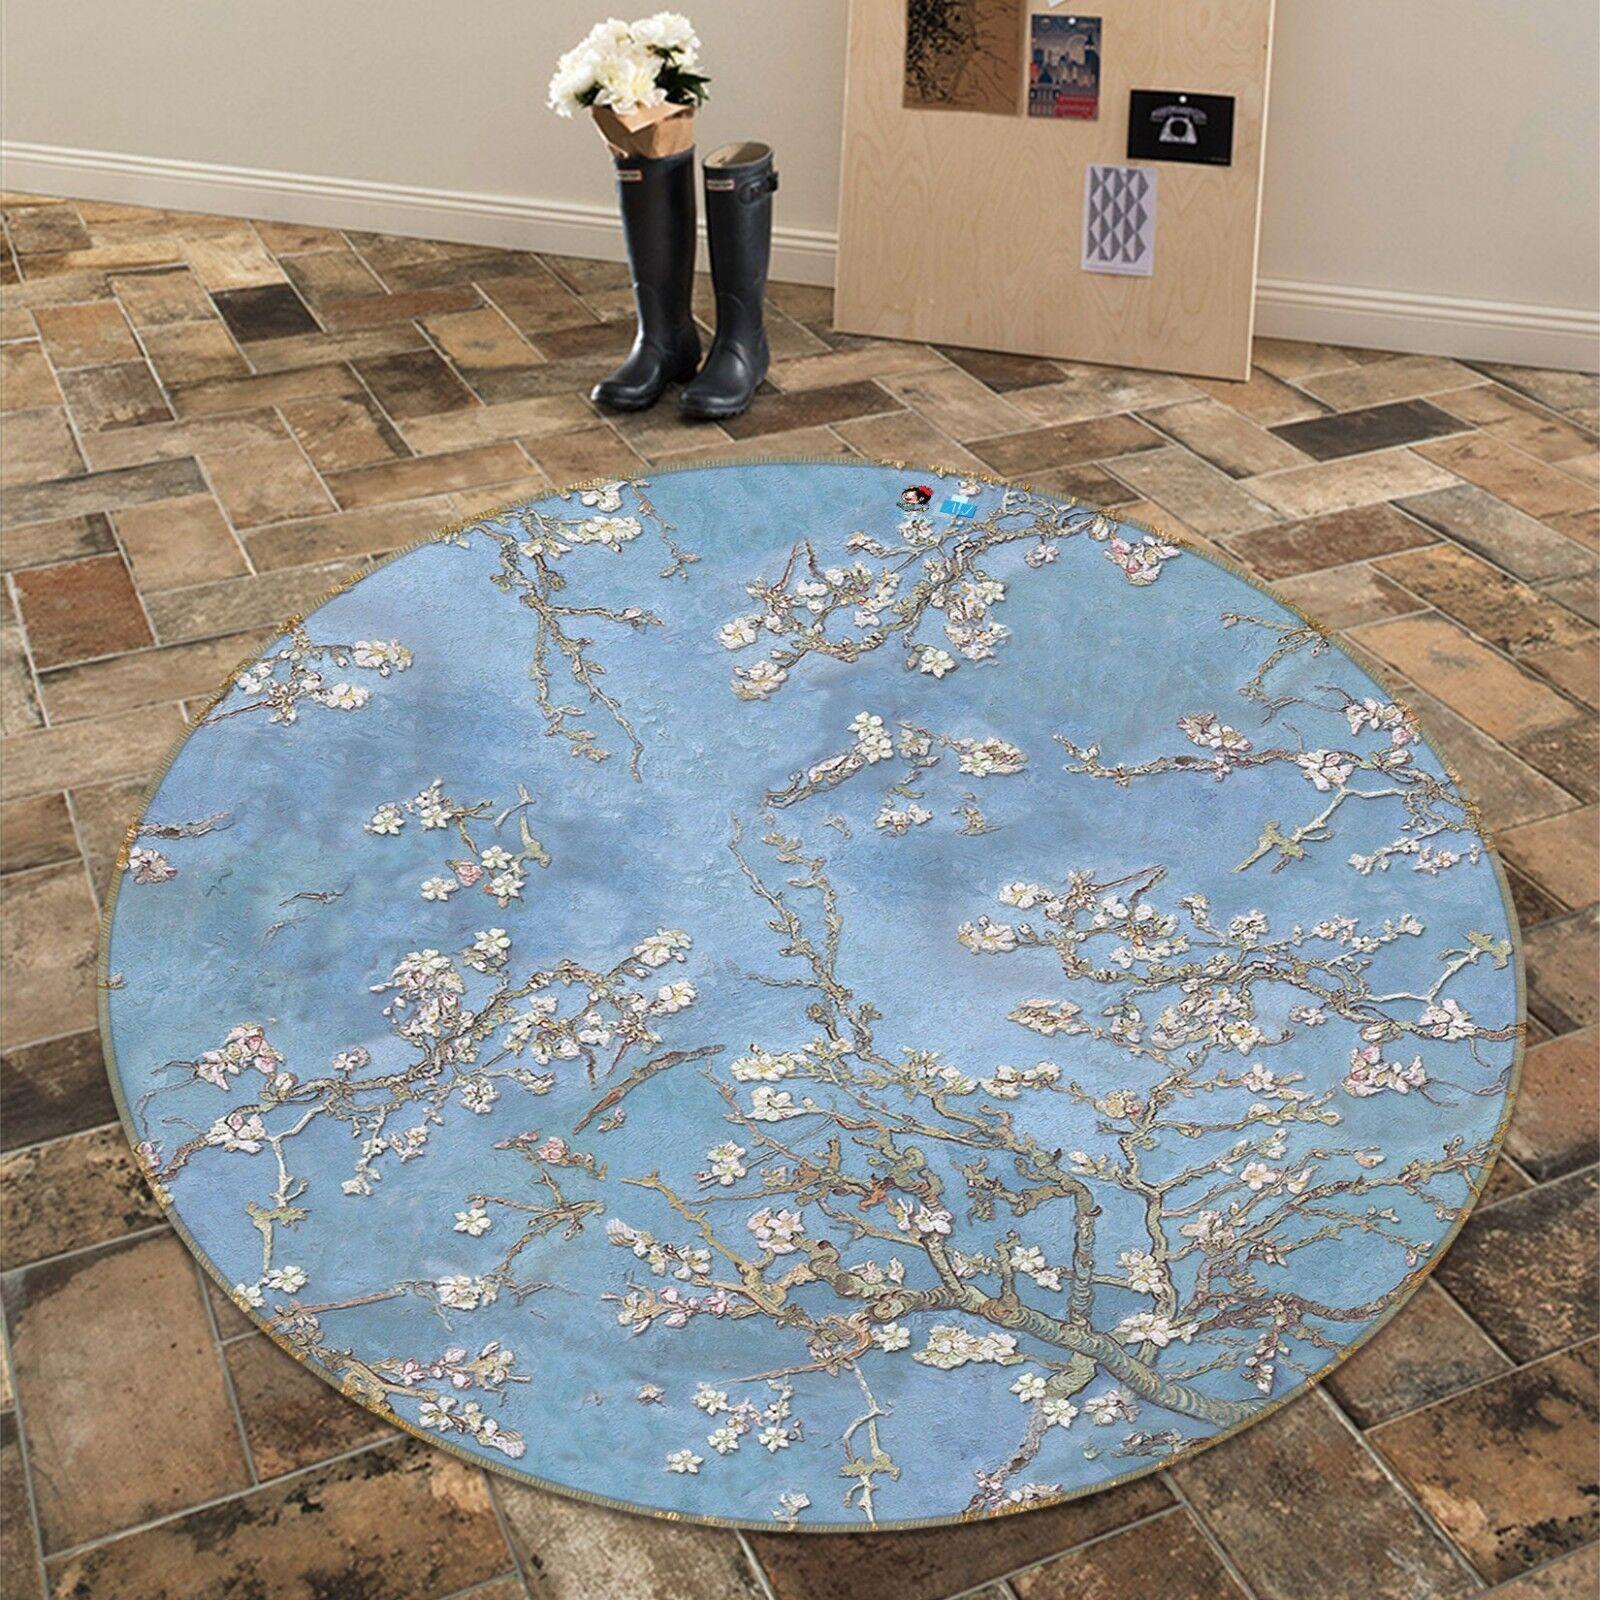 3d árbol de flor cielo 6 antideslizante alfombra maletero rondas elegante alfombra de